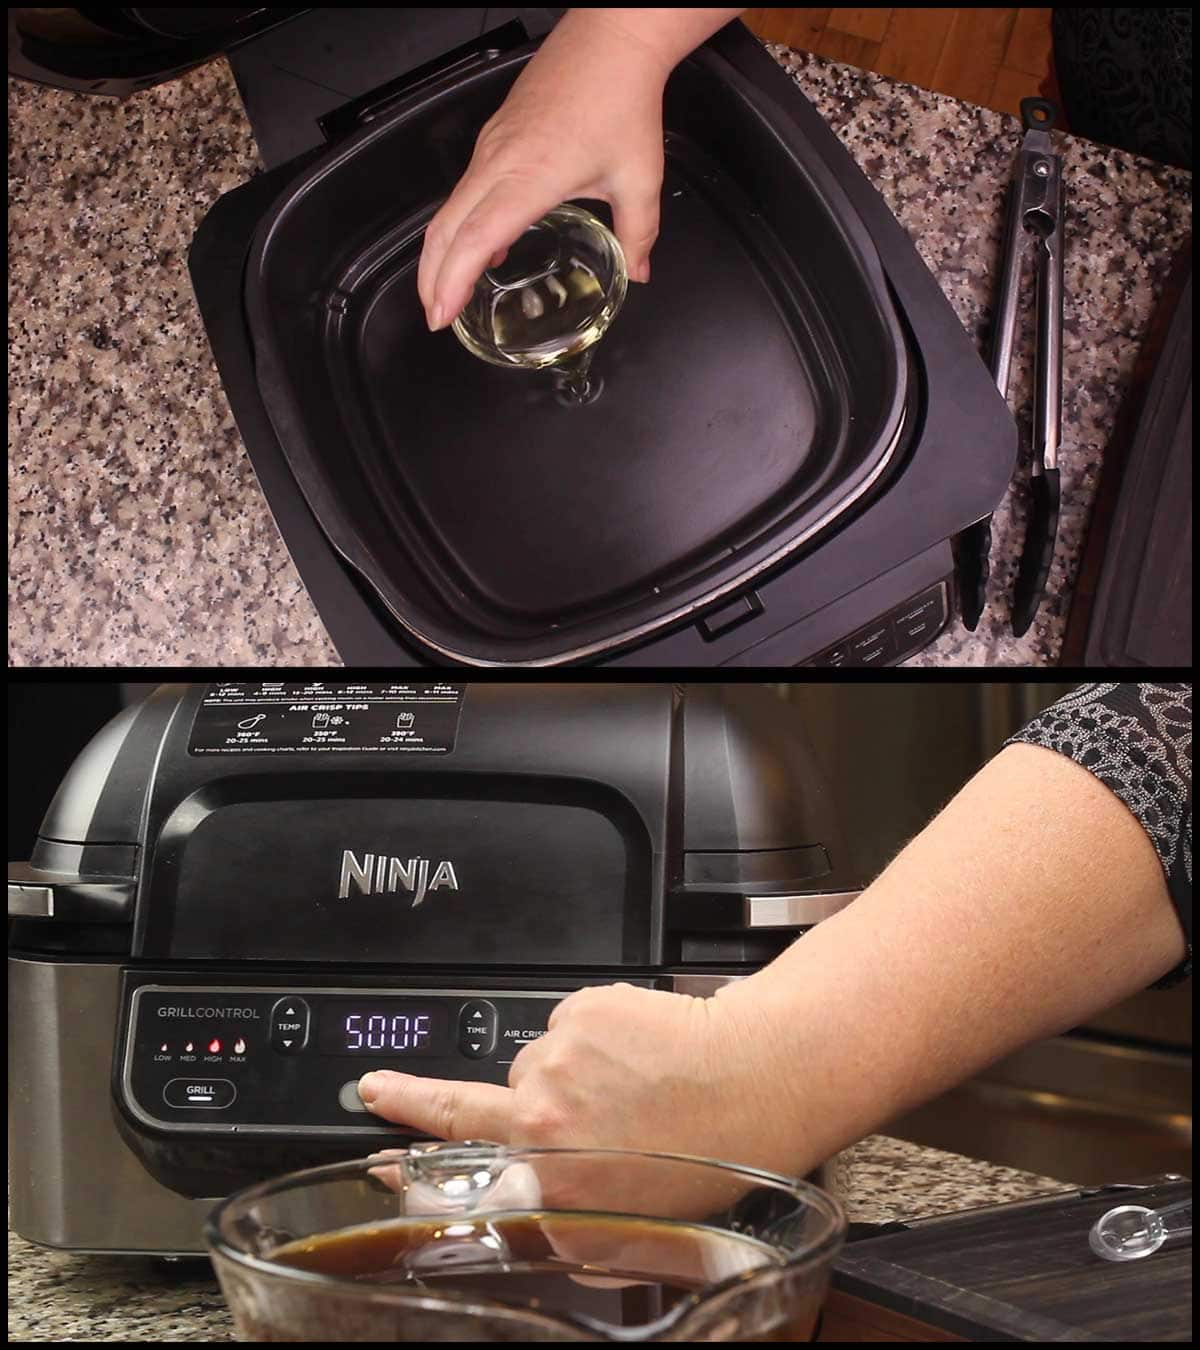 adding oil and preheating to make pot roast in the Ninja Foodi Grill